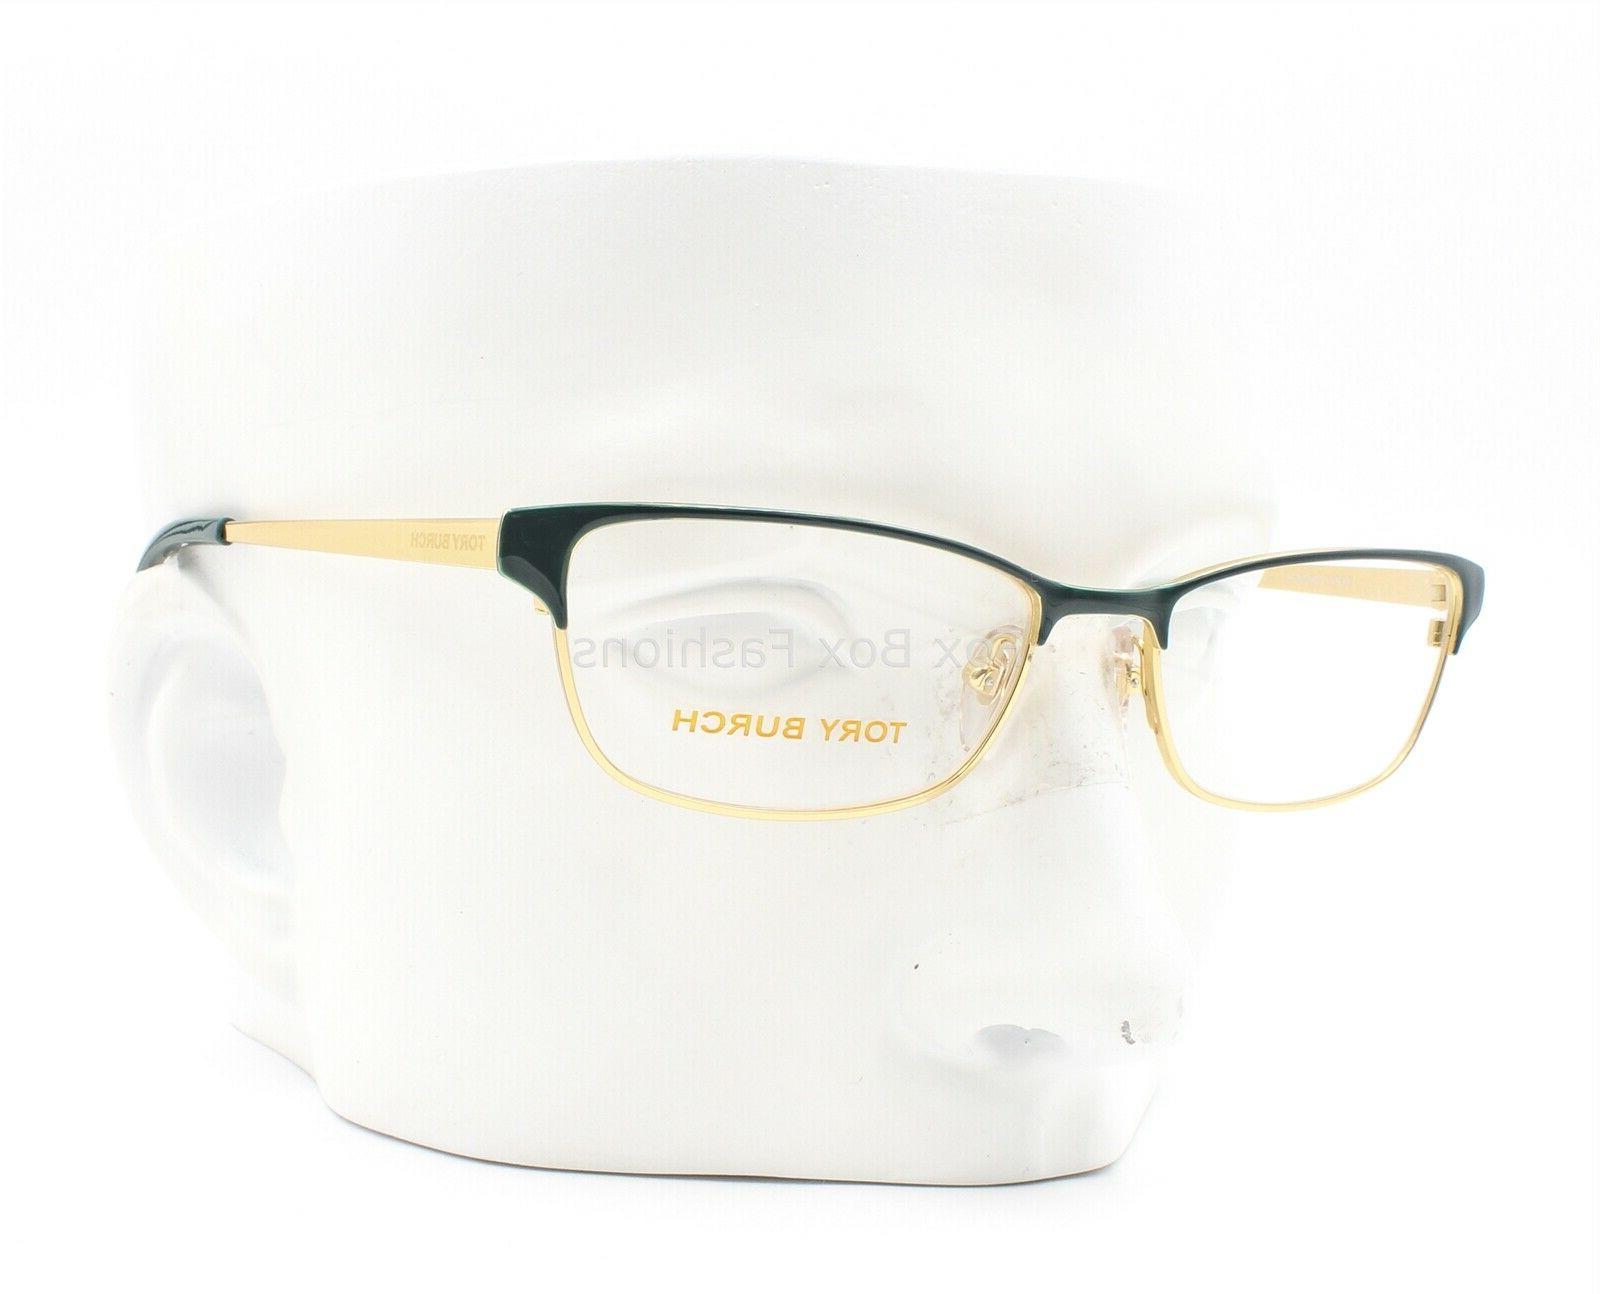 TORY TY 488 Eyeglasses Green & Gold 51-16-140